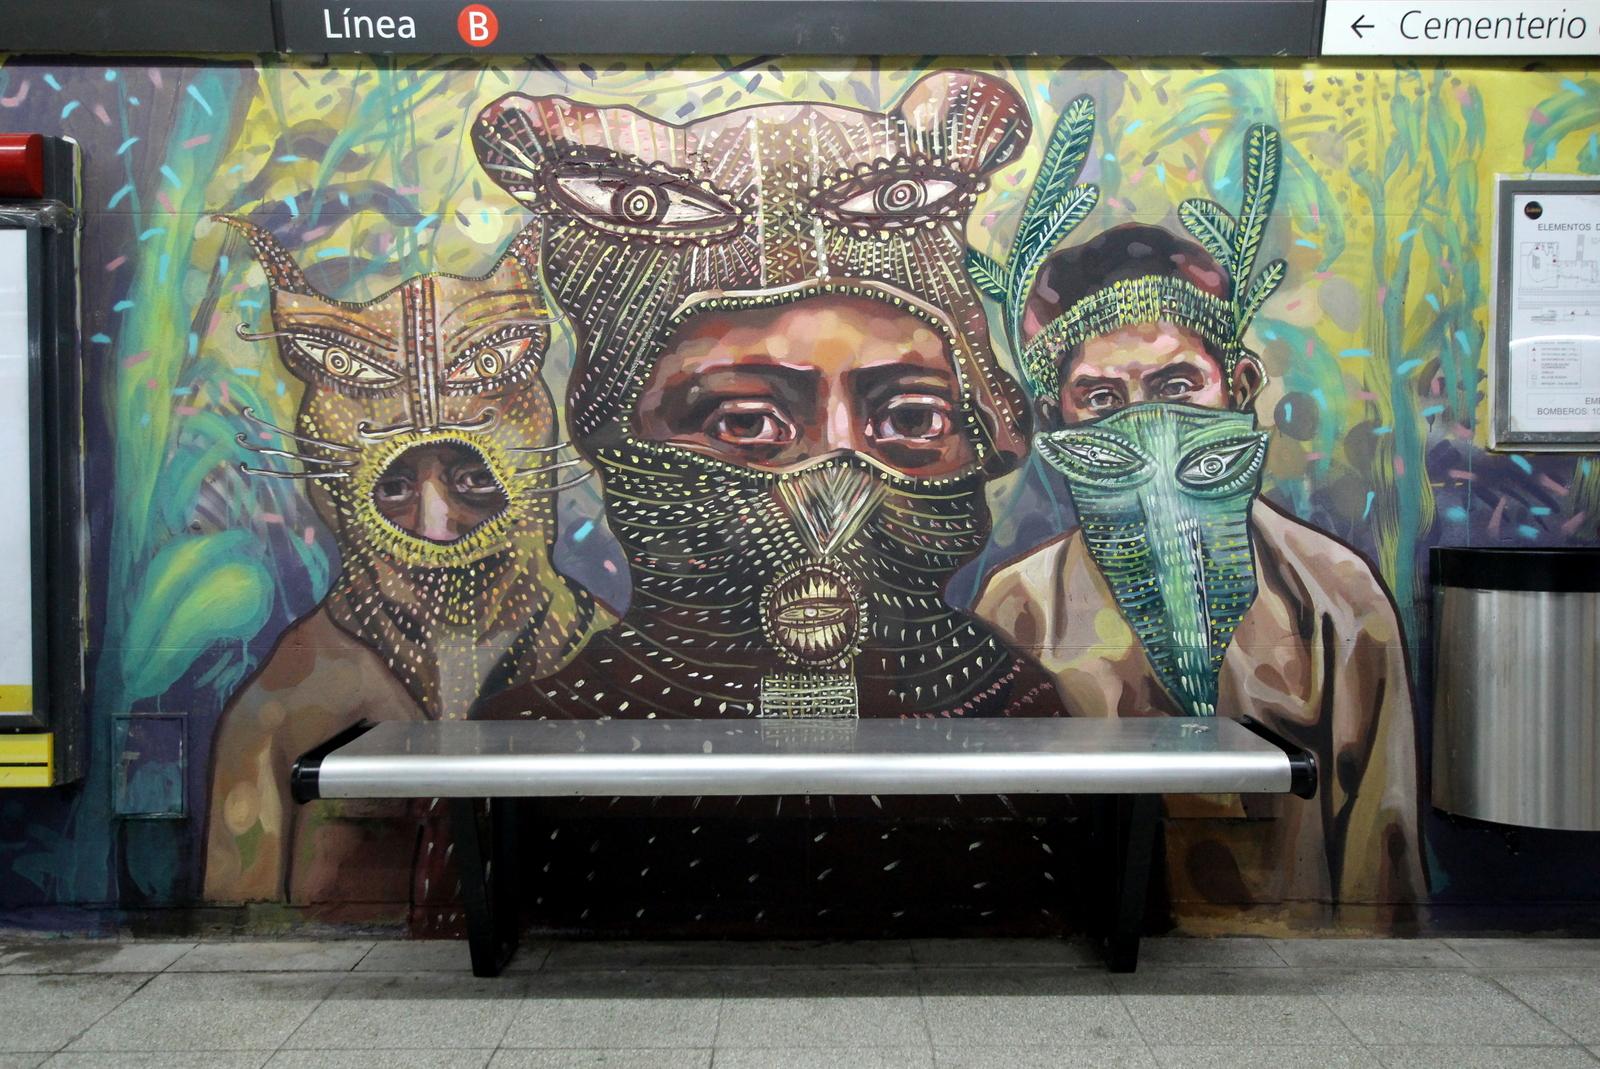 estacion de subte murales buenos aires arte urbano grafiti tour federico lacroze chacarita